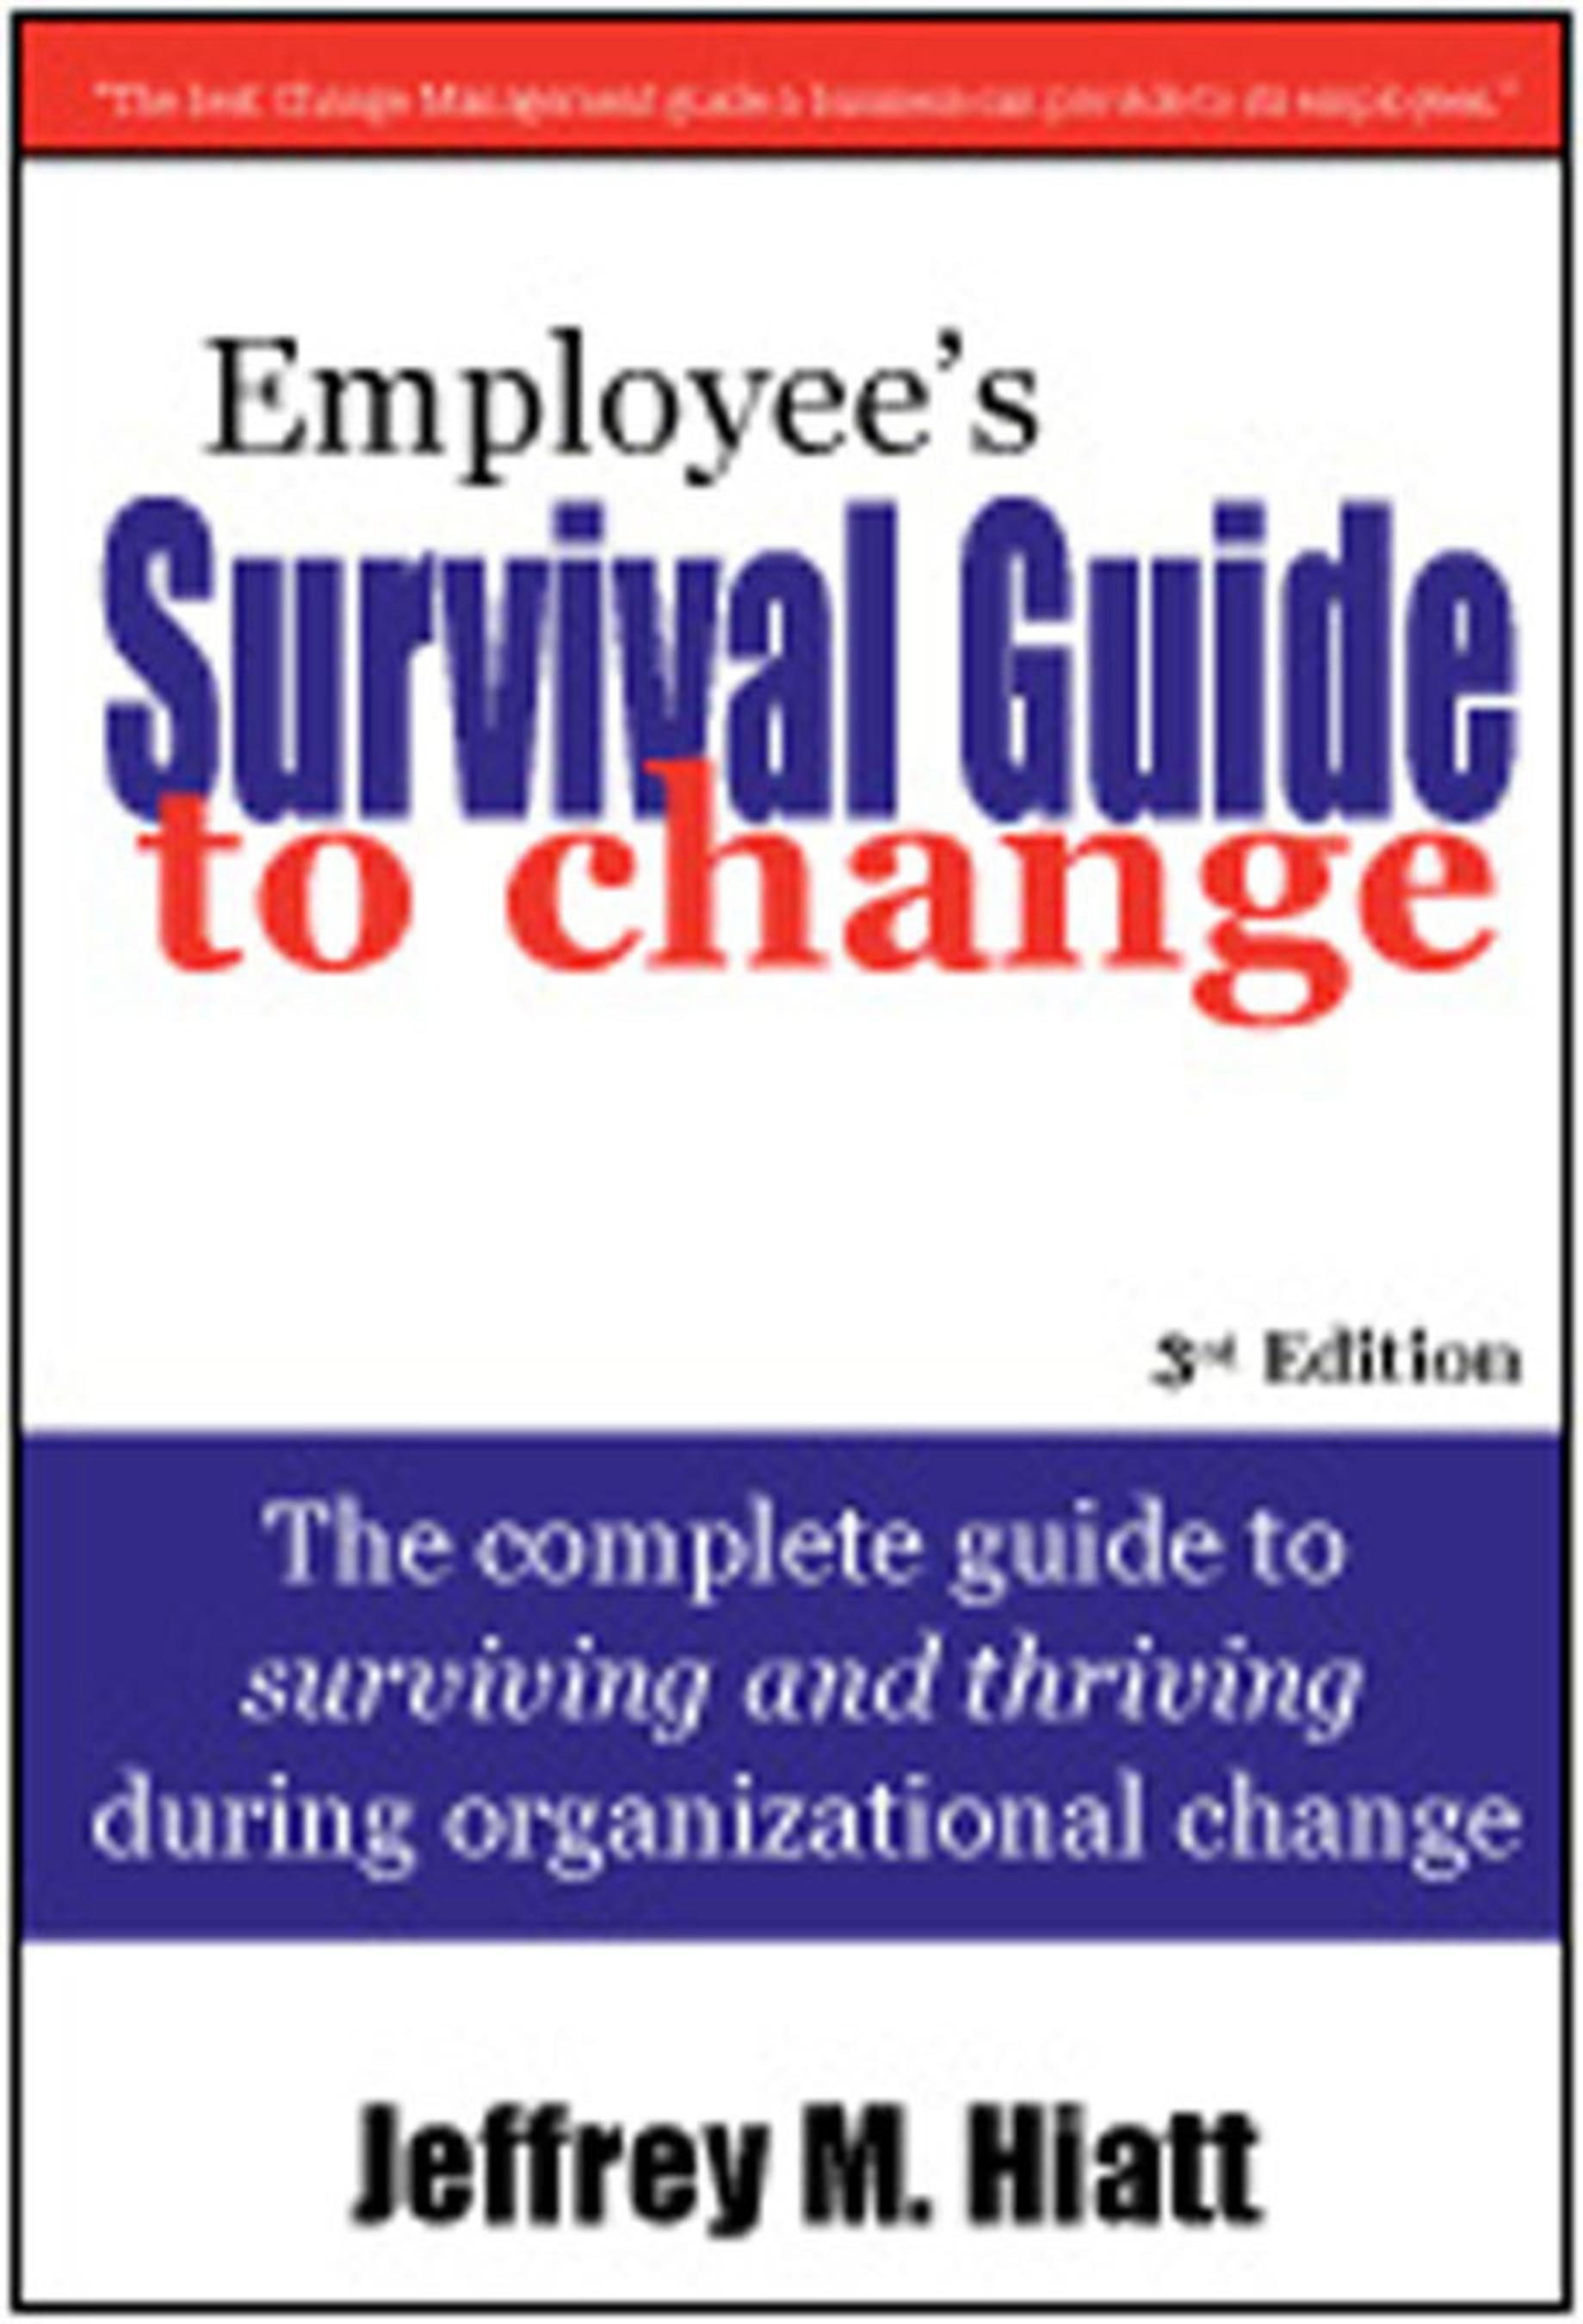 Employee's Survival Guide to Change Book Cover.  (PRNewsFoto/Prosci)